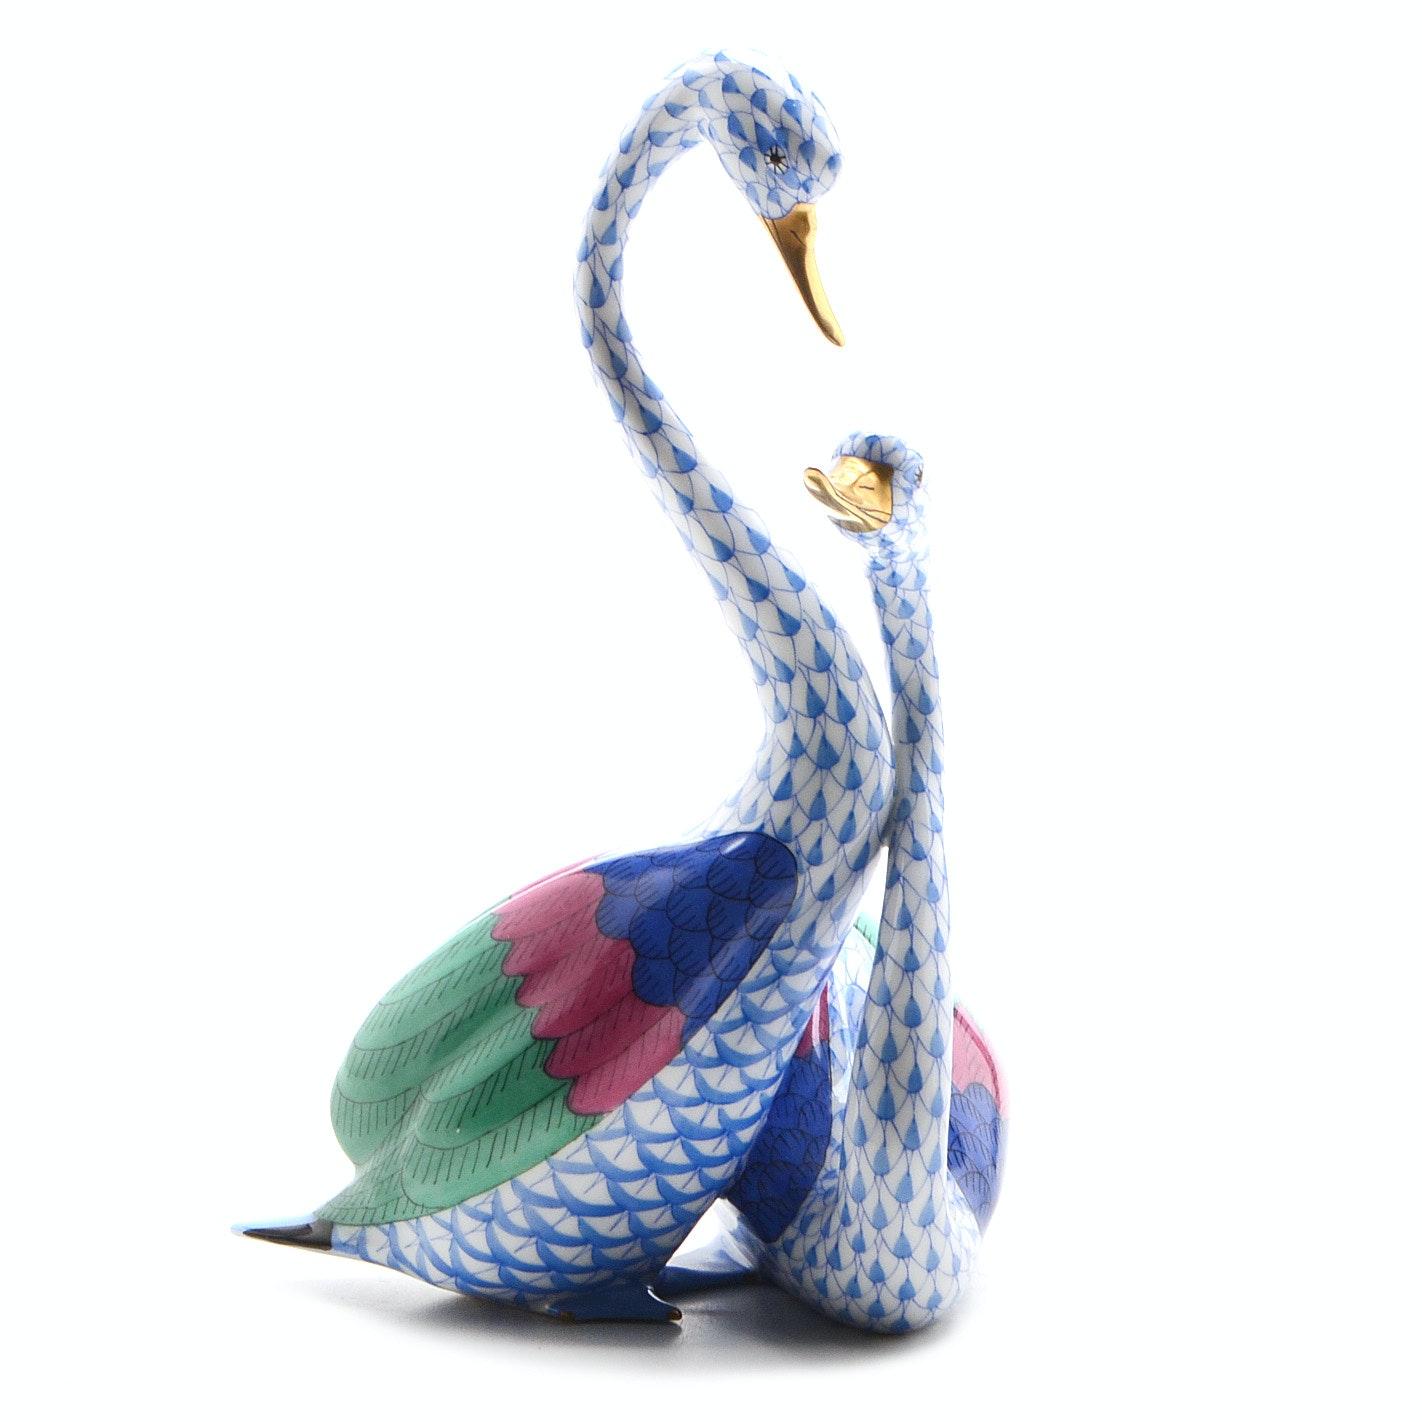 Herend Hungary Porcelain Swan Figurine